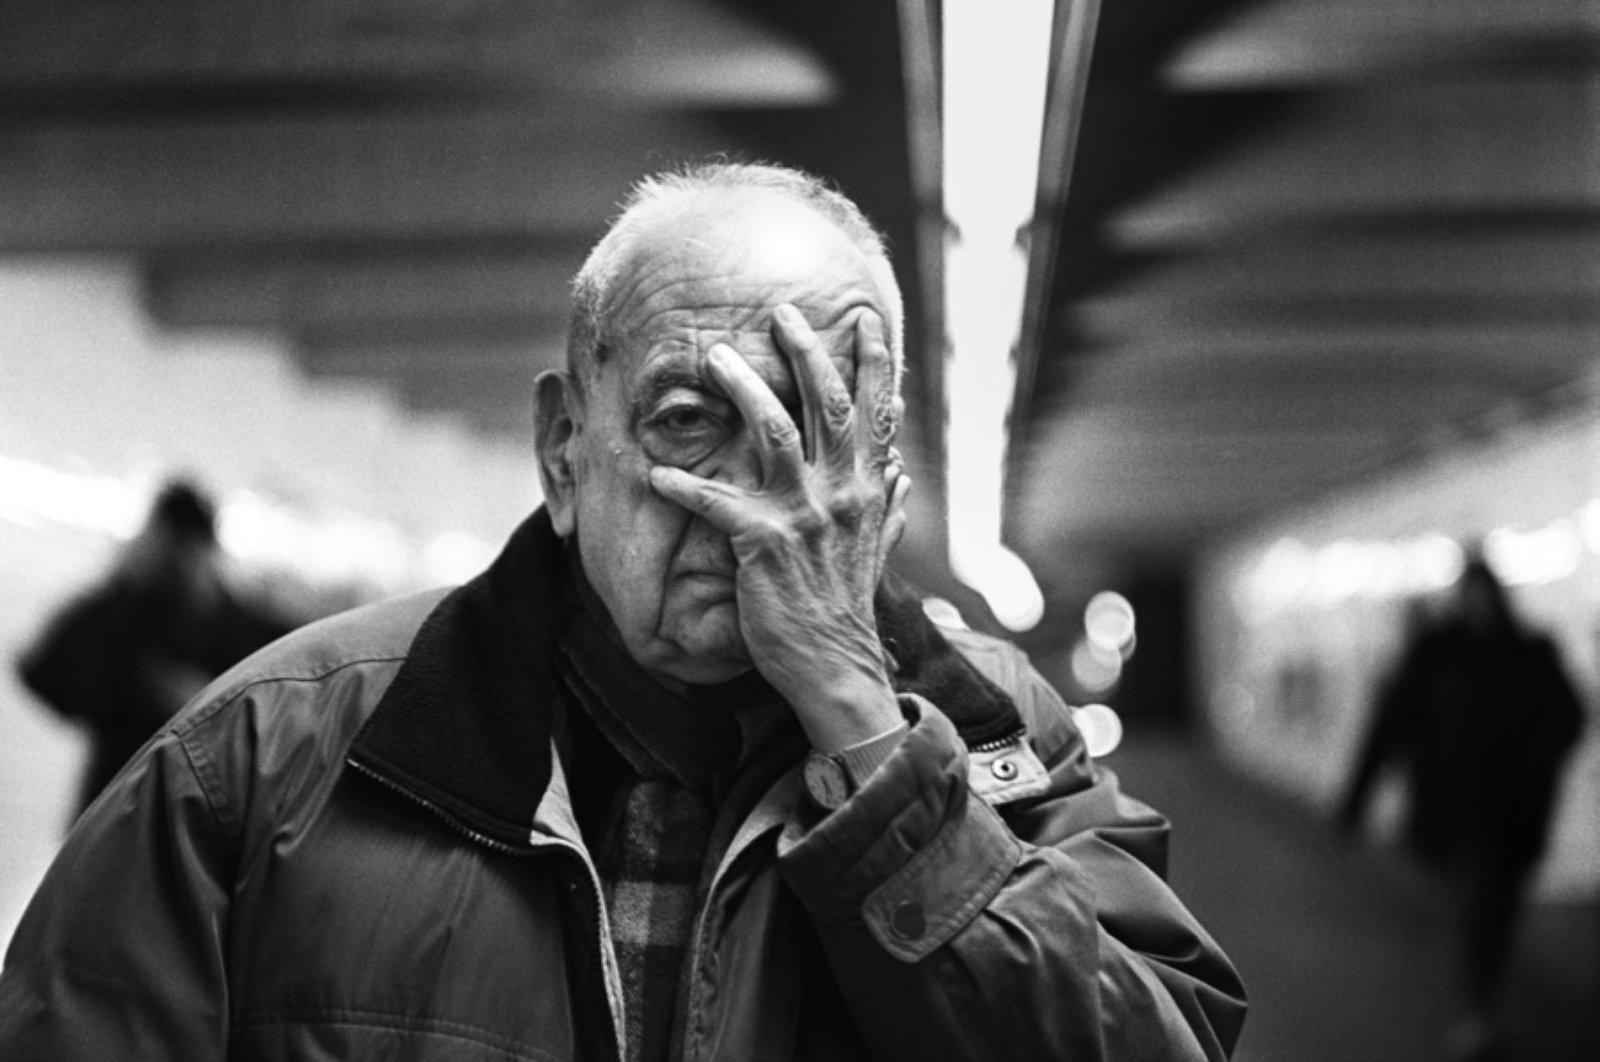 """Mimaroğlu"" presents photos from Ilhan Mimaroğlu's personal archive. (Photo Courtesy of Heimatlos Films)"